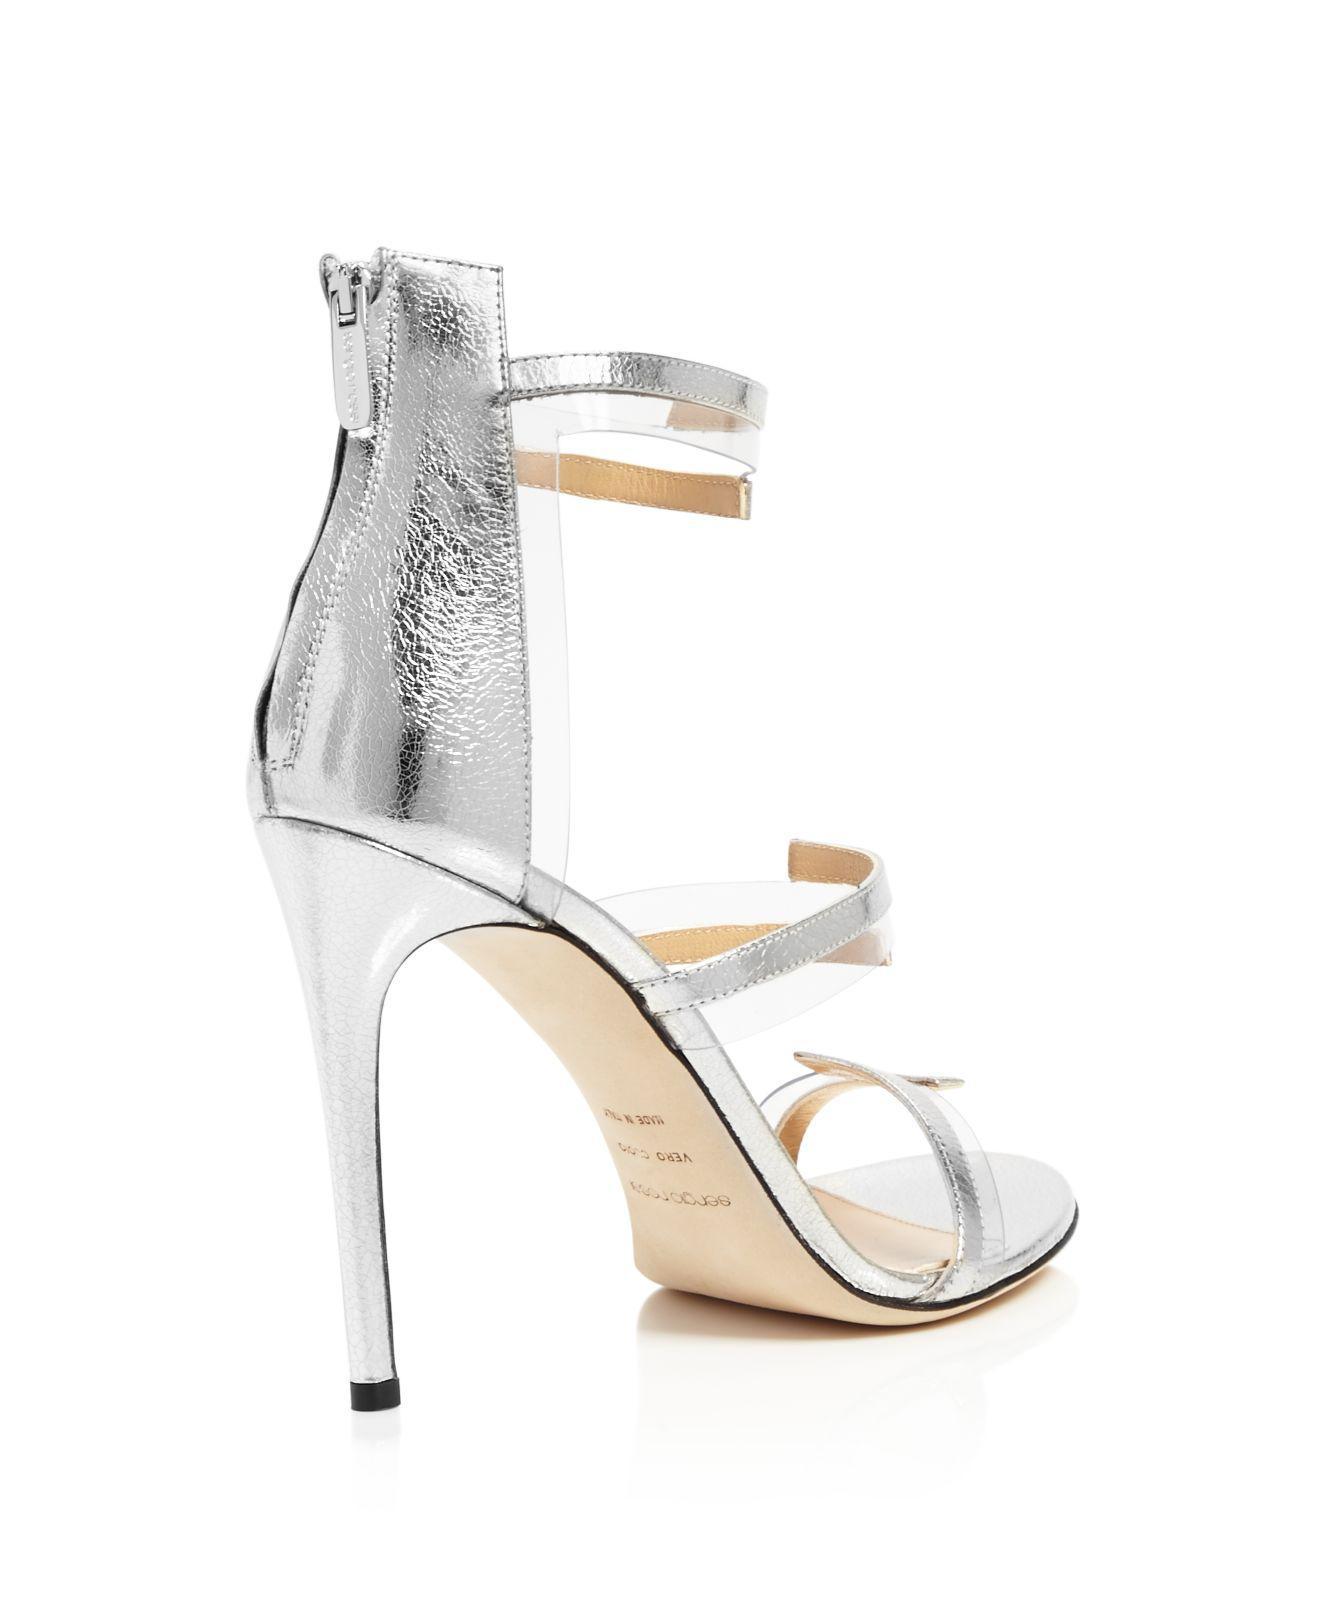 Sergio Rossi Karen Triple Strap Illusion High-Heel Sandals TfhdWHM4